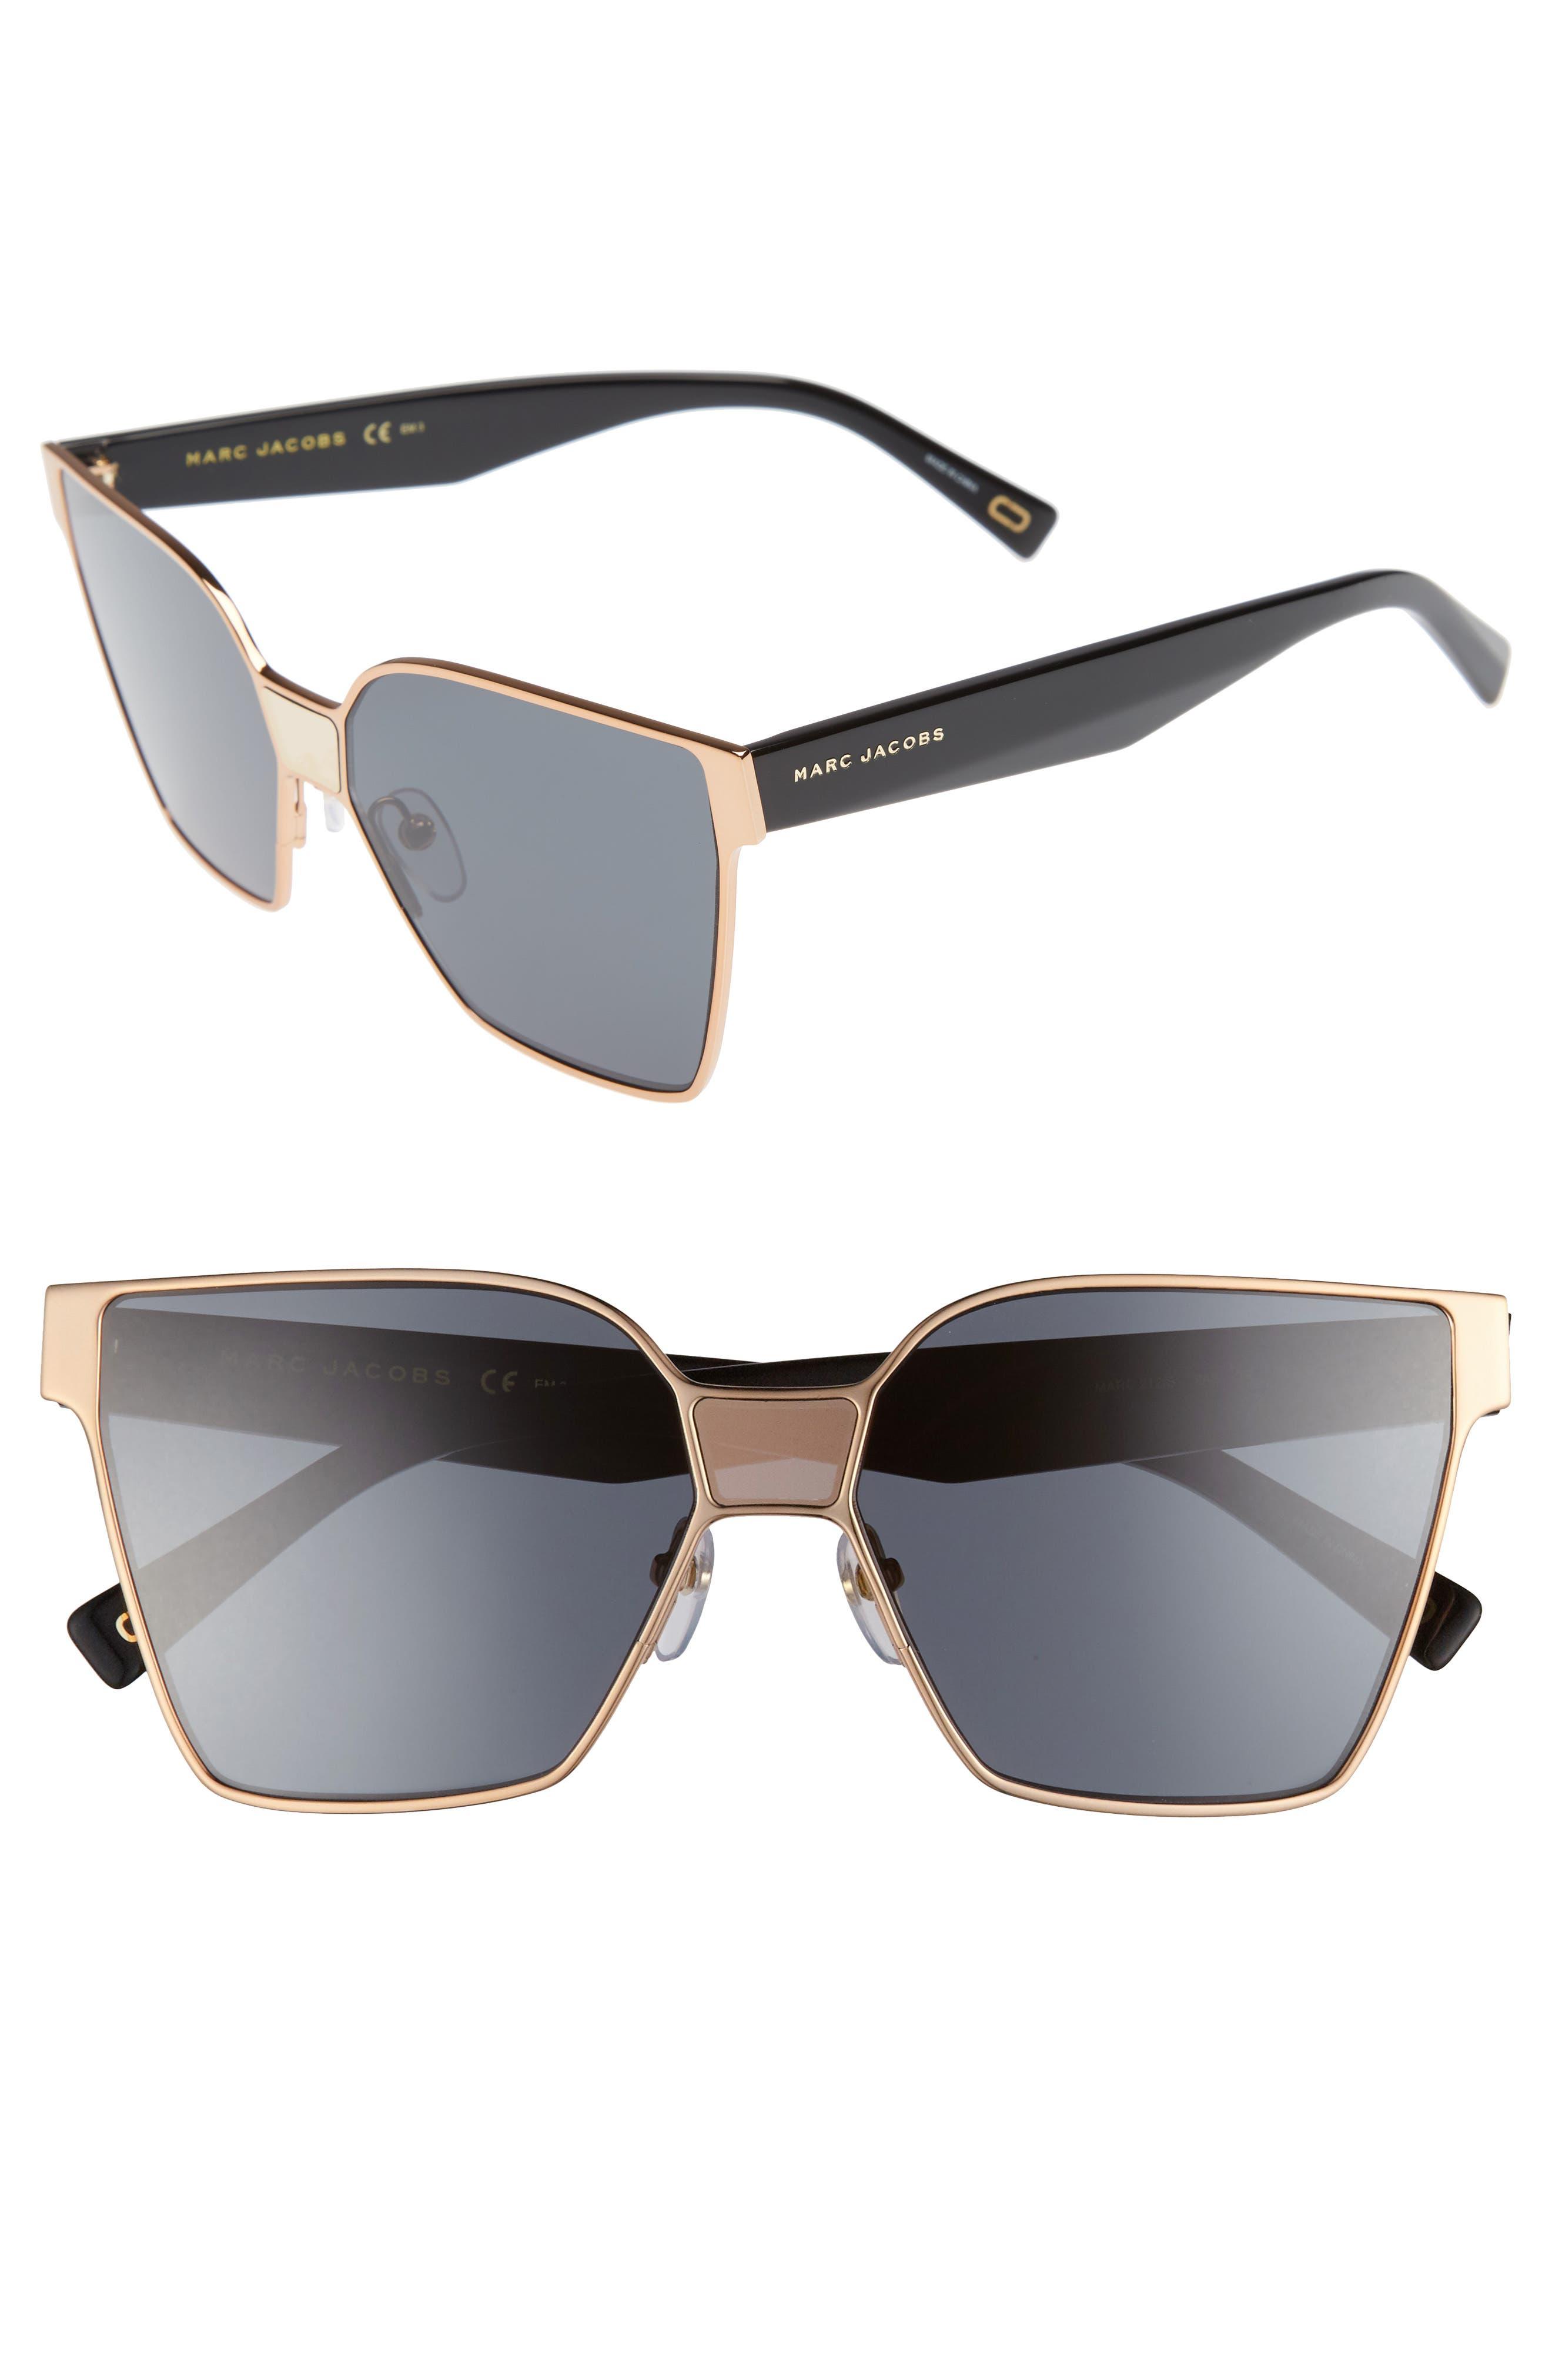 MARC JACOBS 60mm Square Sunglasses